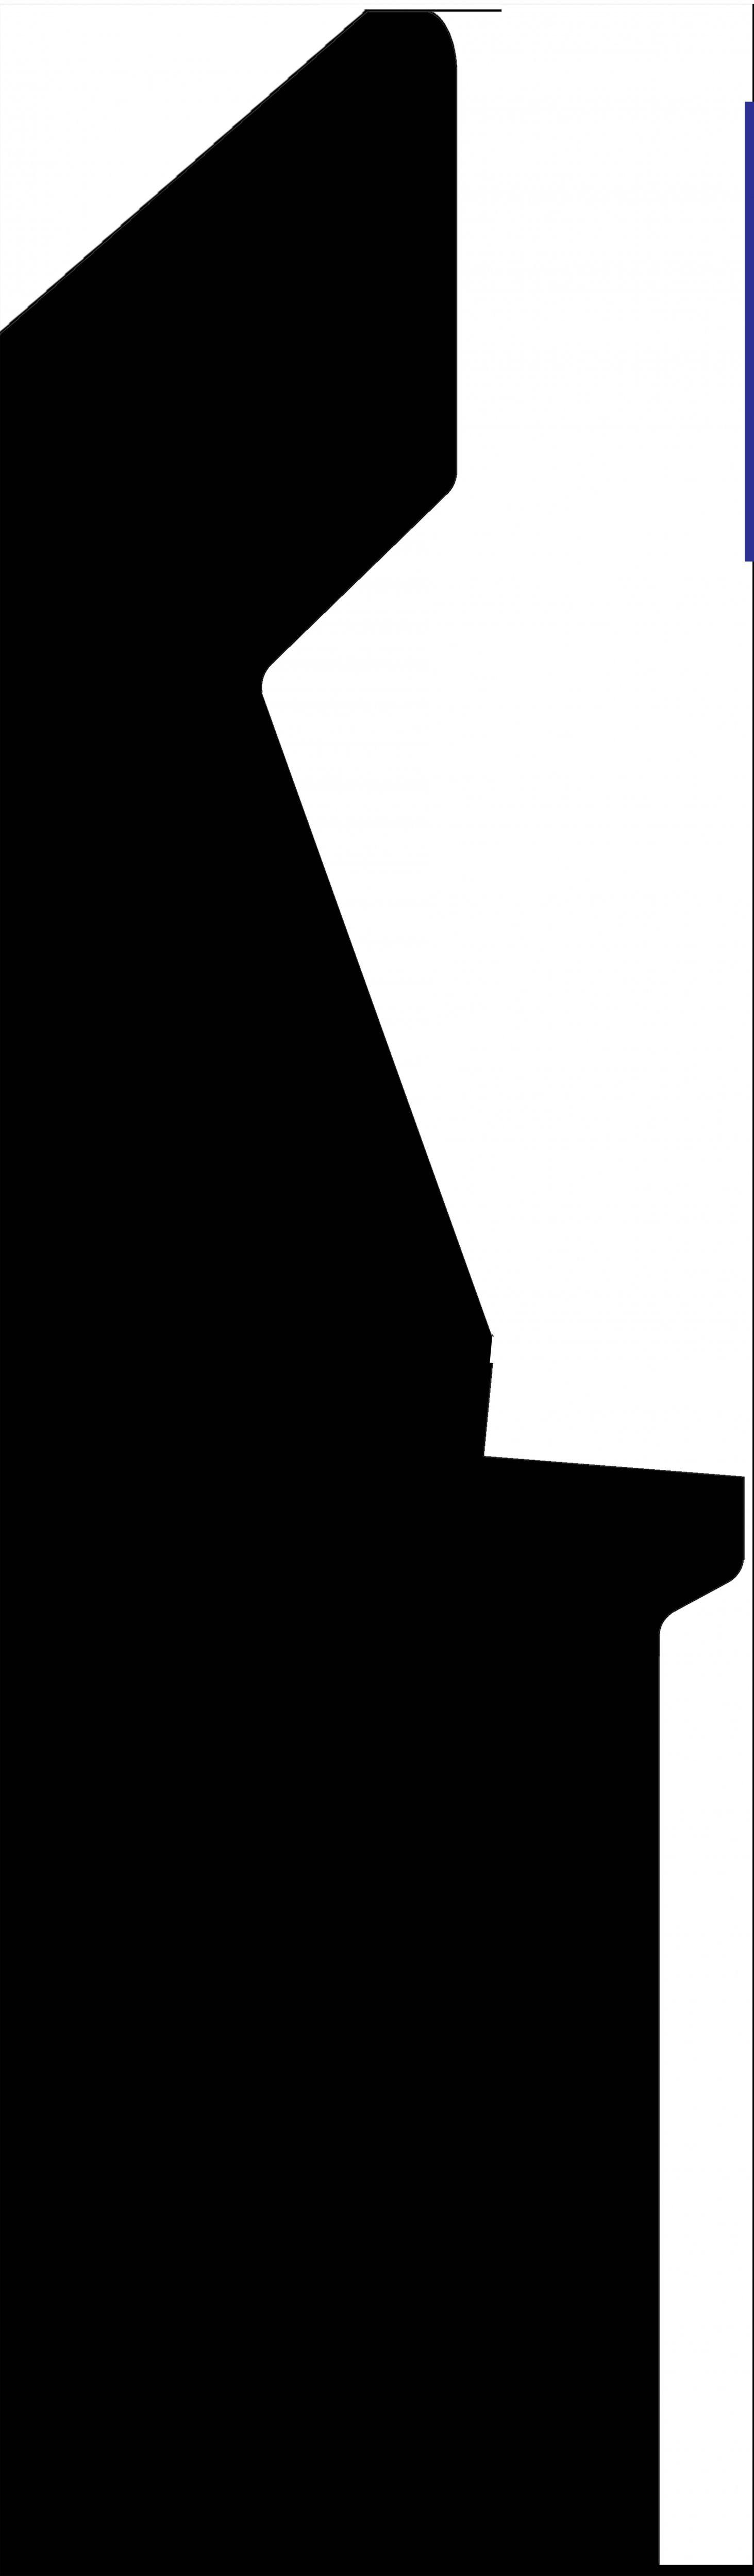 BLACKOUT_TALL_MARQUEE_ModdedBlankSideTemplate.jpg